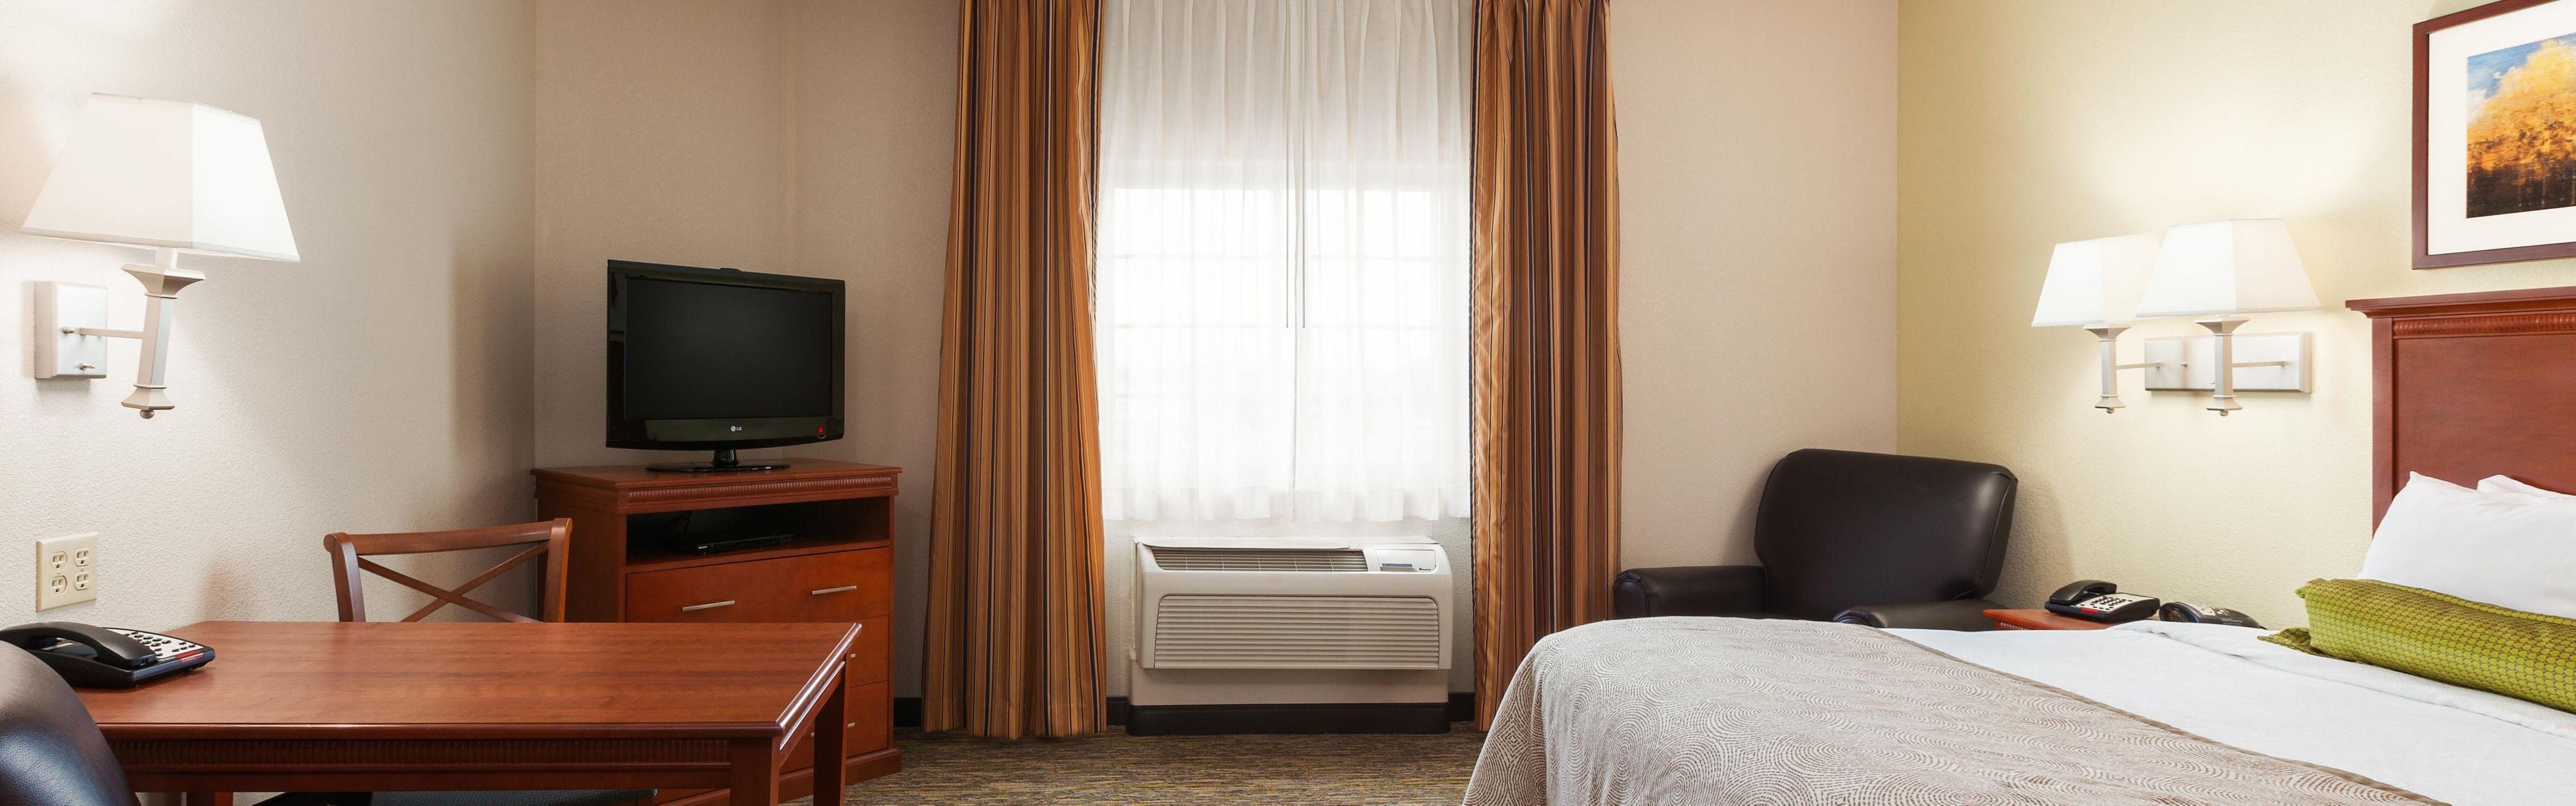 Candlewood Suites Lake Jackson-Clute image 1